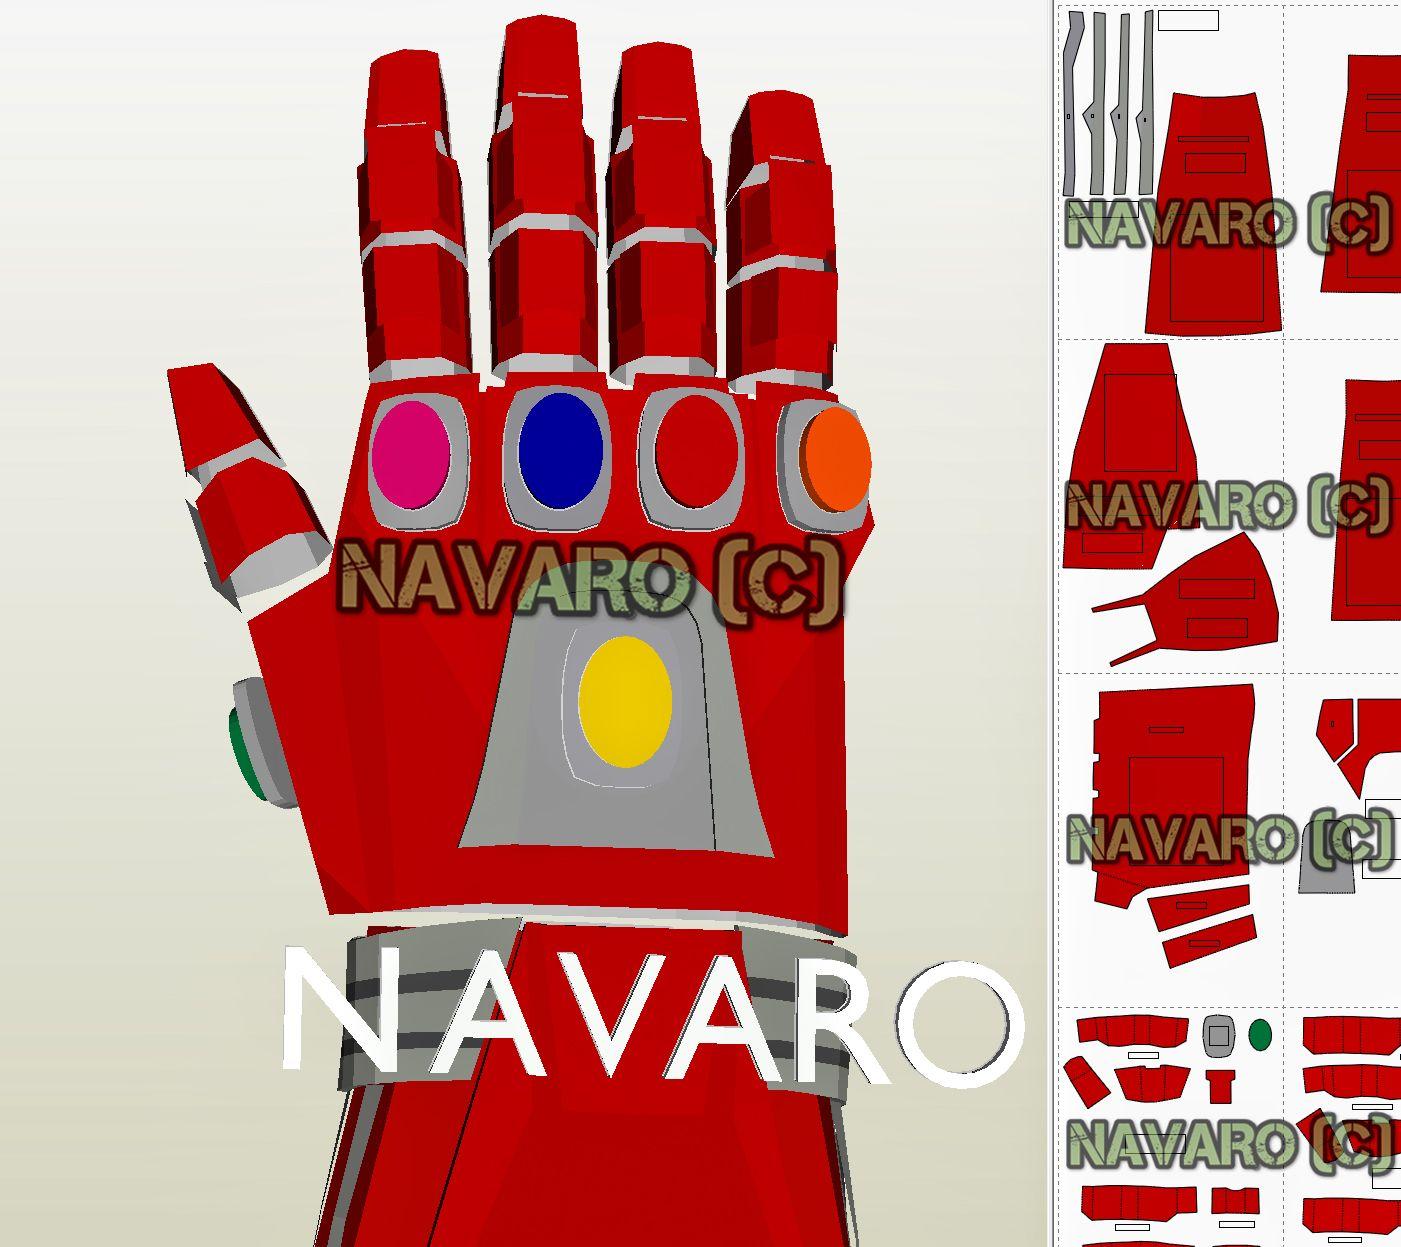 Infinity Gauntlet Pattern Endgame Csoplay Iron Man Gauntlet Iron Man Helmet Iron Man Cosplay Deathstroke Cosplay